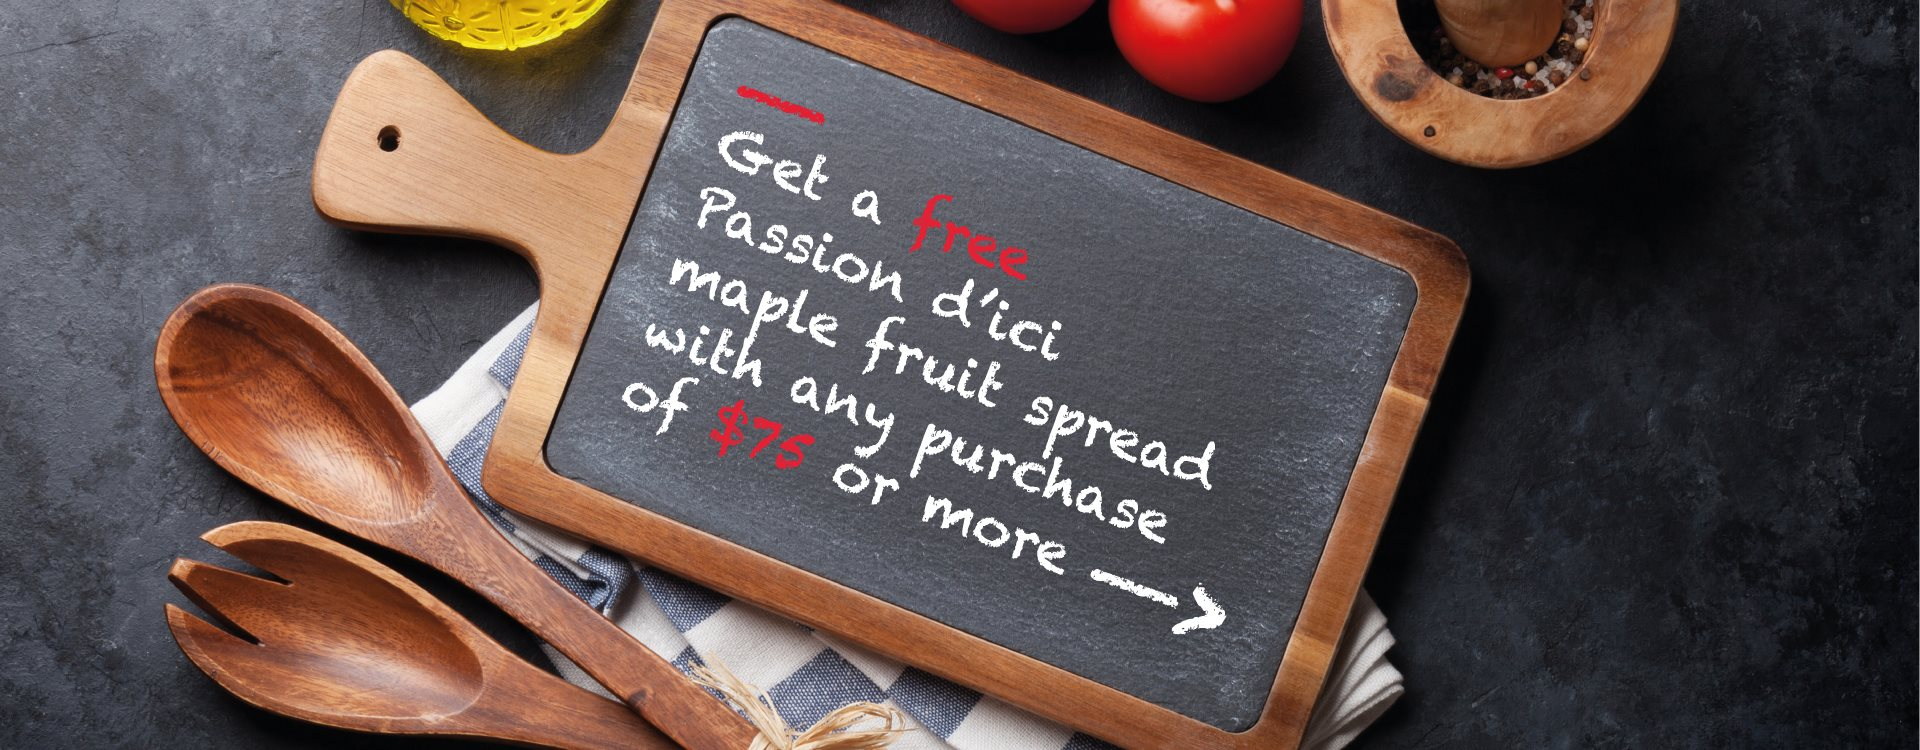 Free maple spread